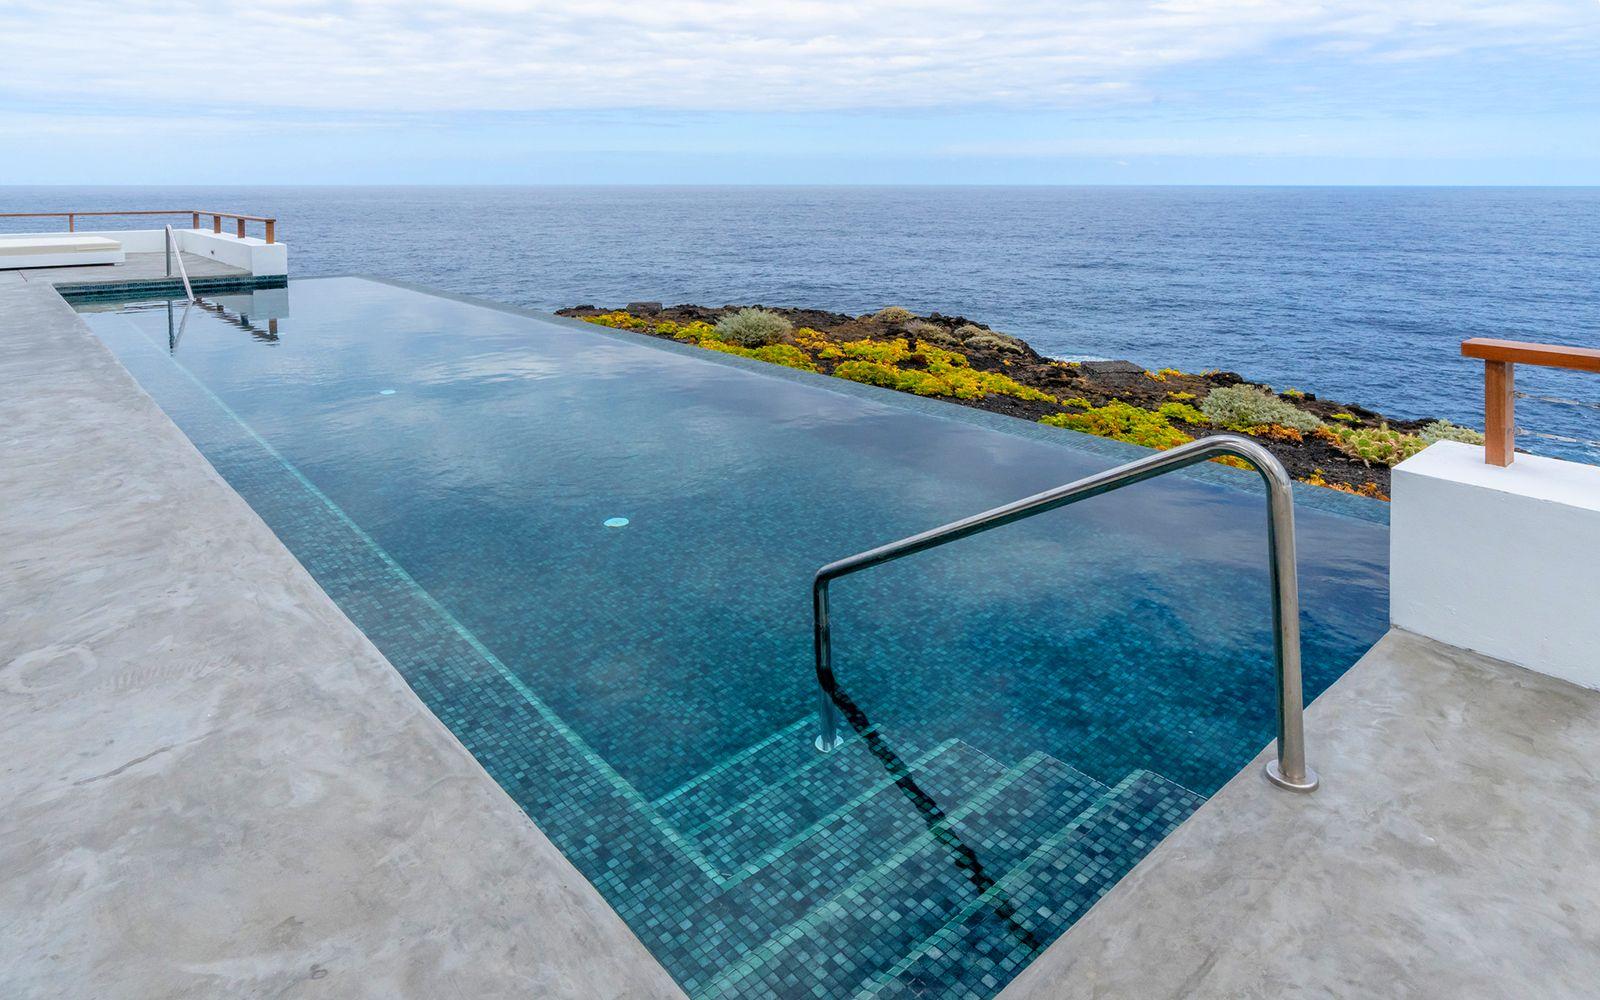 Charmante boutique Hotels Pool Faro Punta Cumplida Hotel